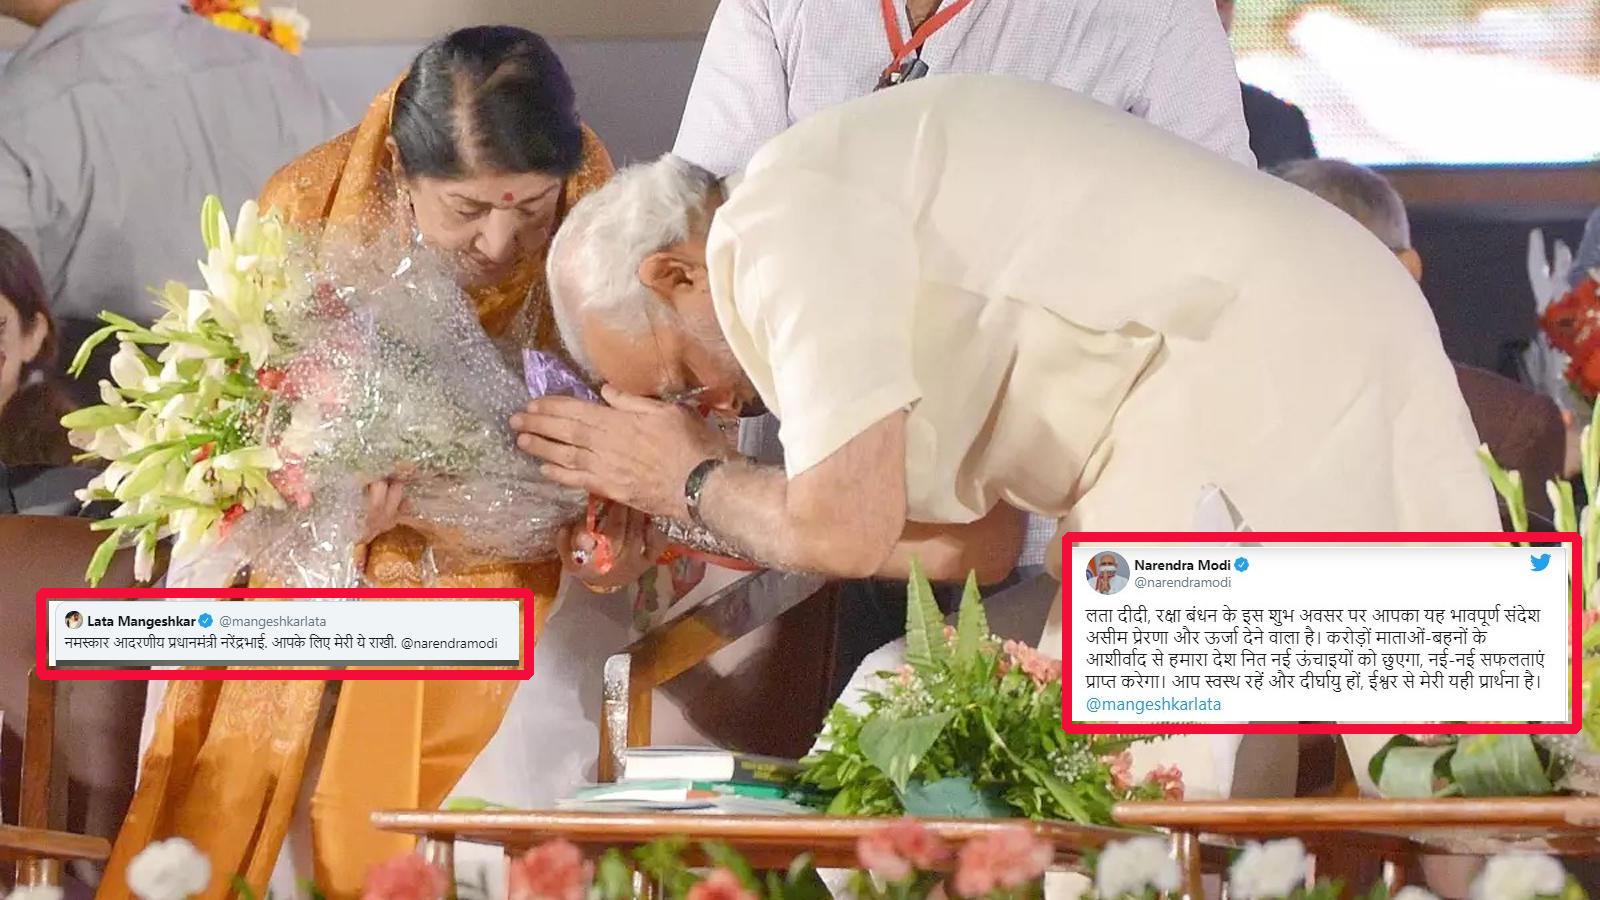 lata-mangeshkar-sends-heartfelt-wishes-to-prime-minister-narendra-modi-on-raksha-bandhan